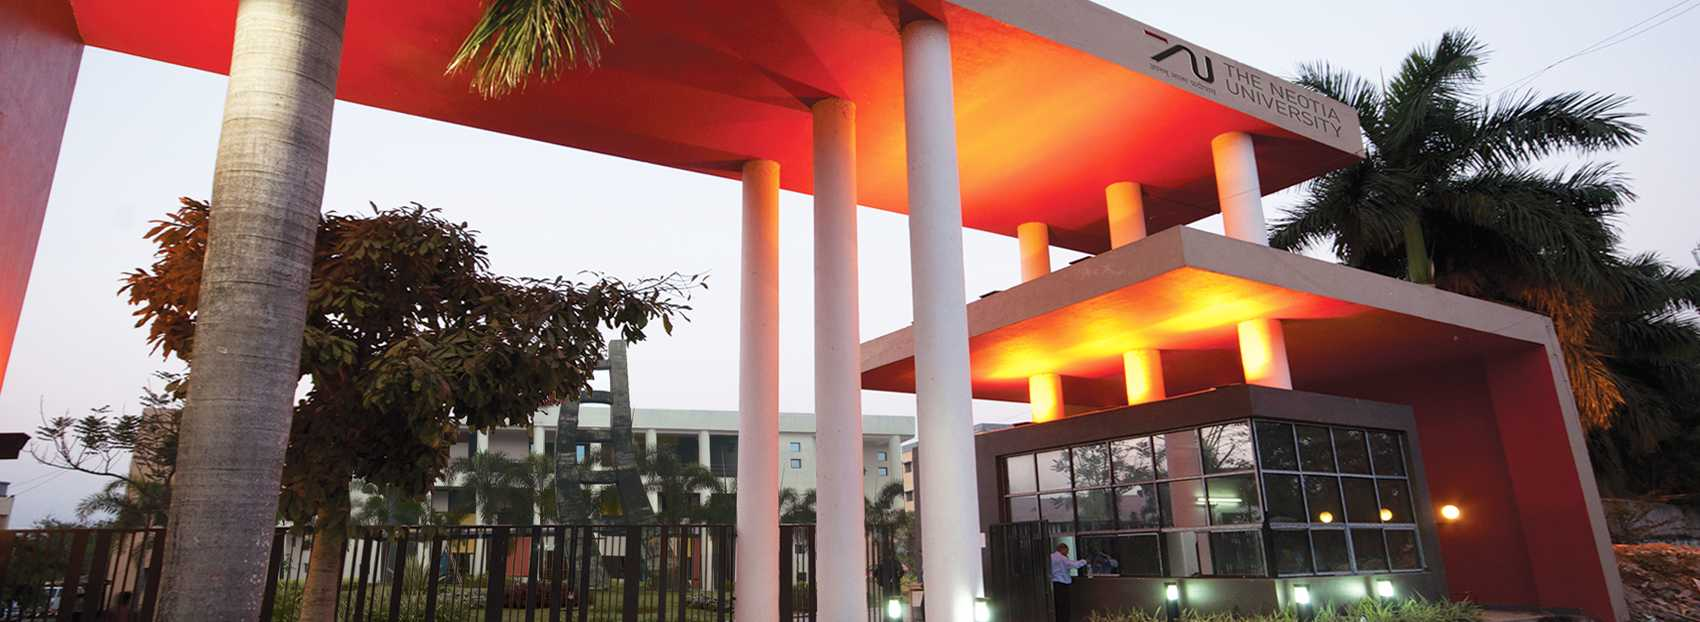 The Neotia University Gallery Photo 1